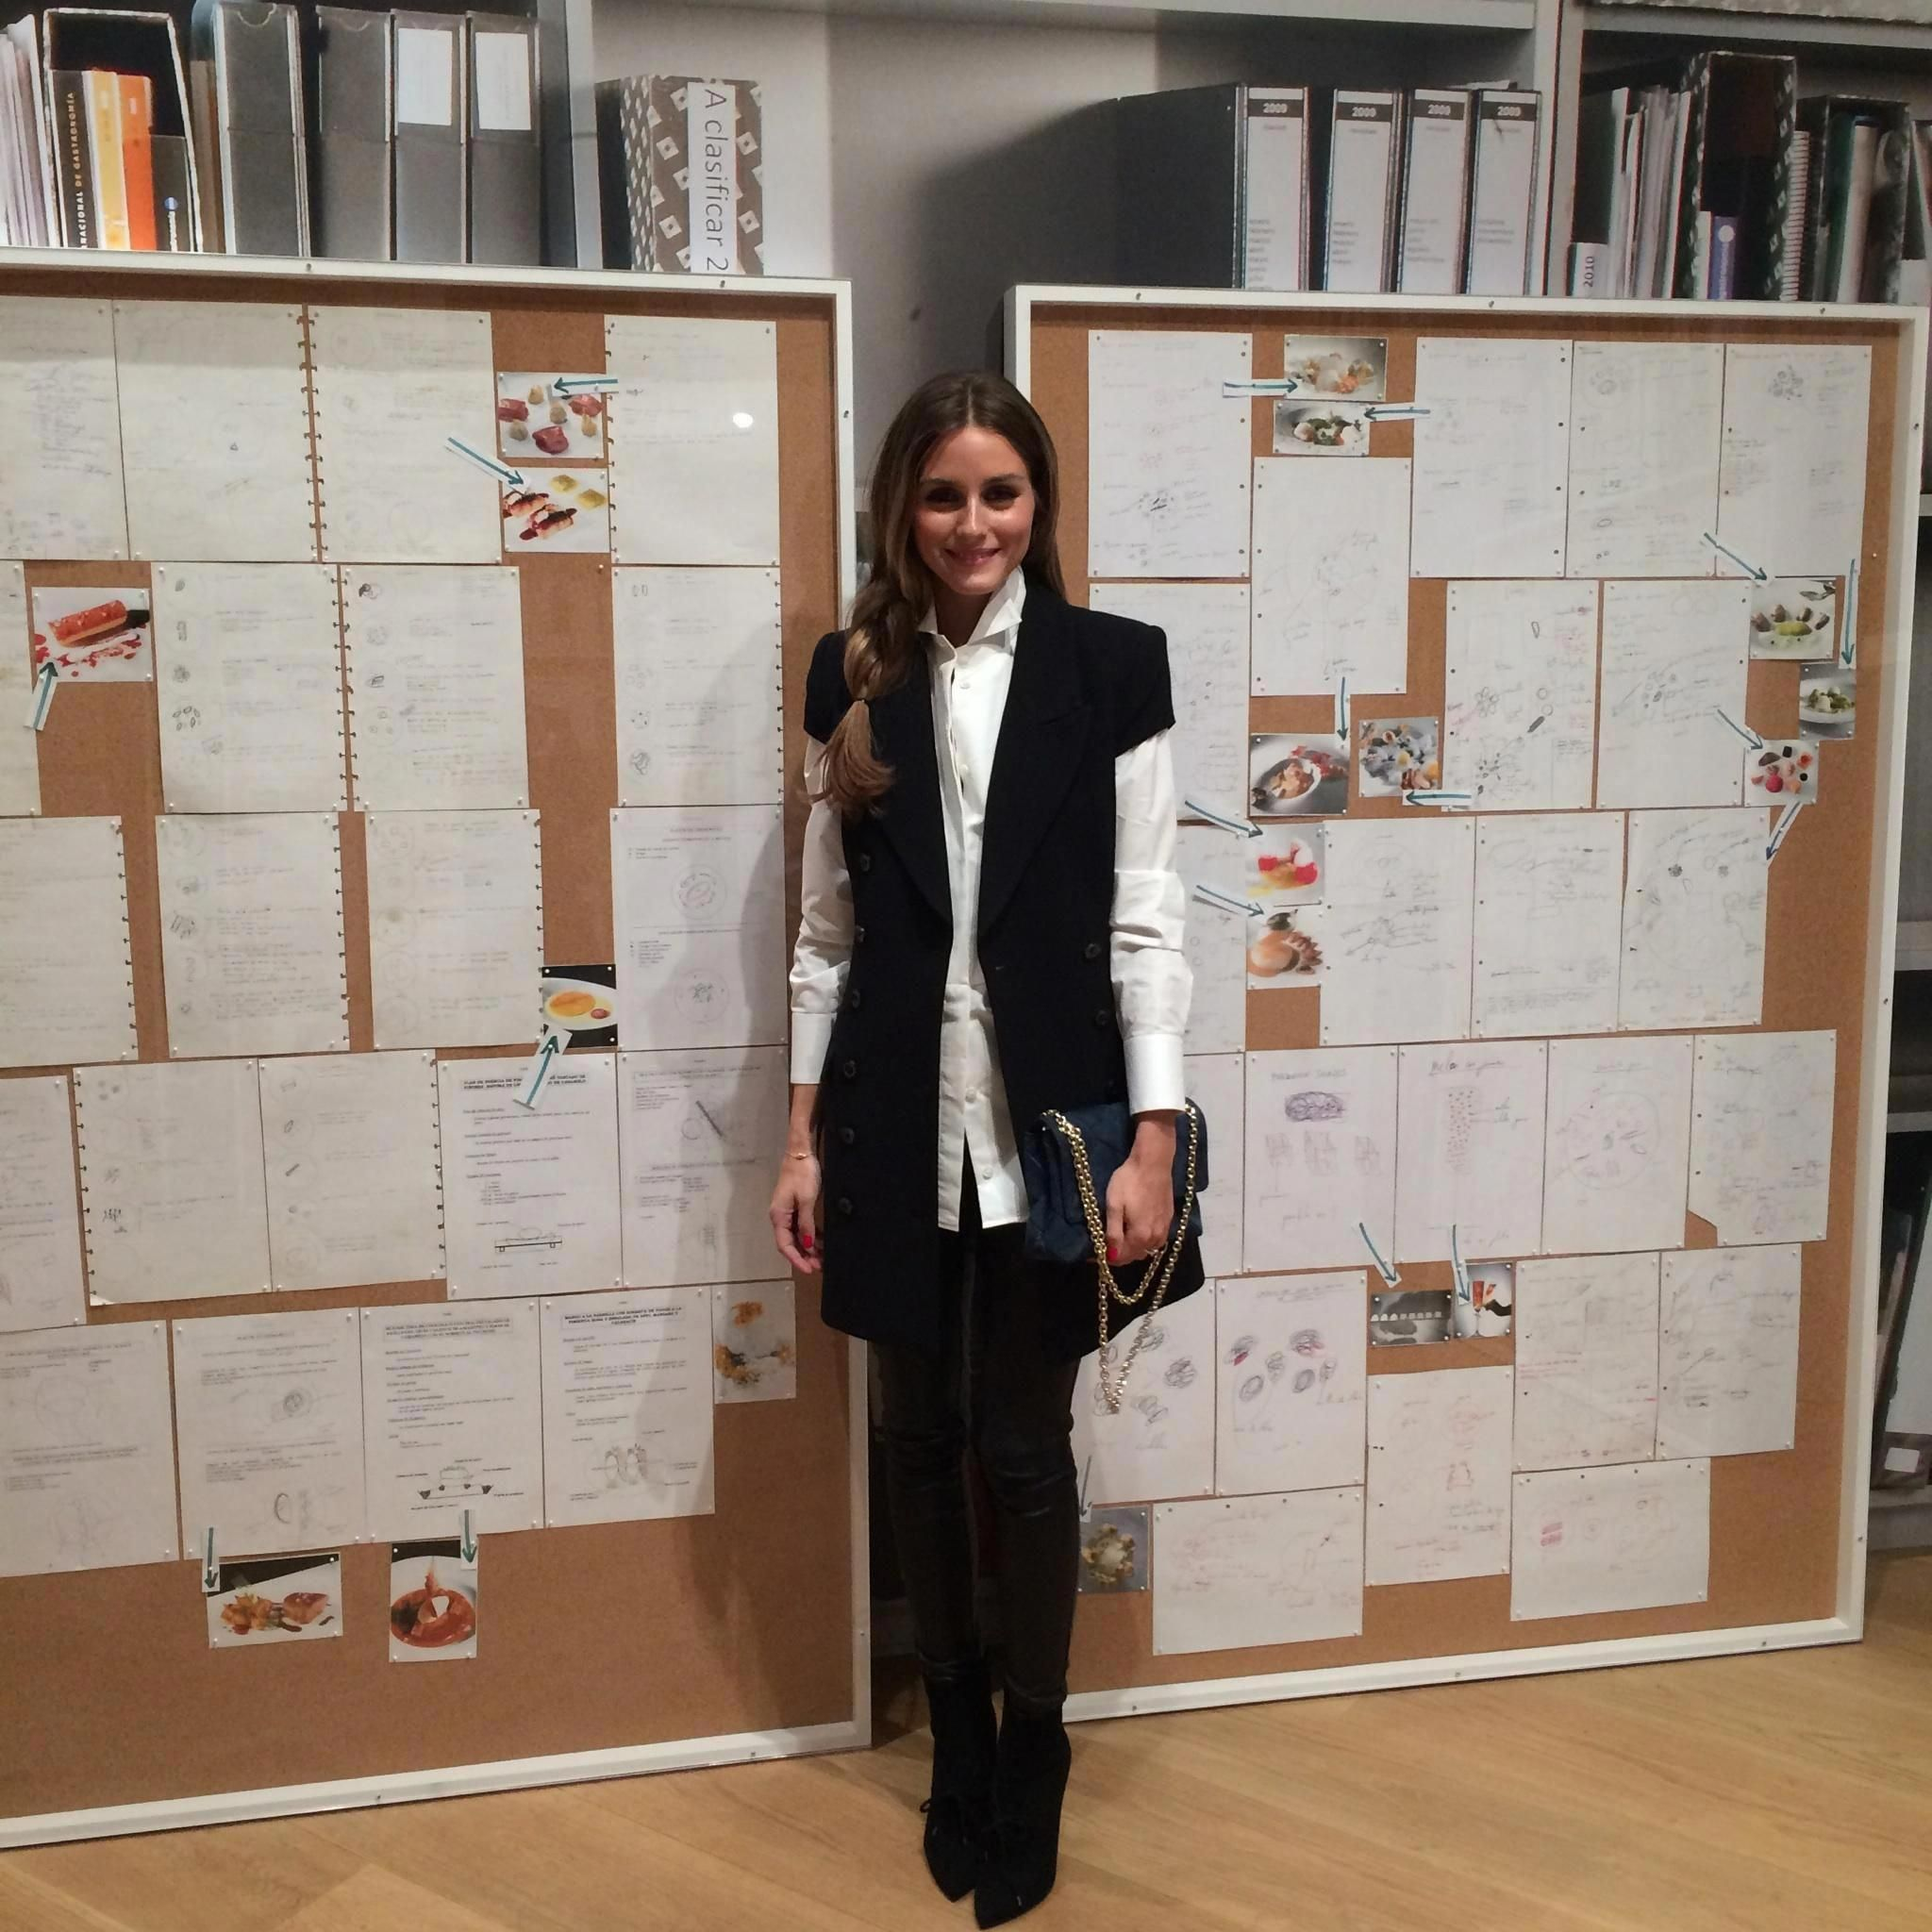 a4d39a2bd44 Olivia in a Giorgio Armani shirt and shoes